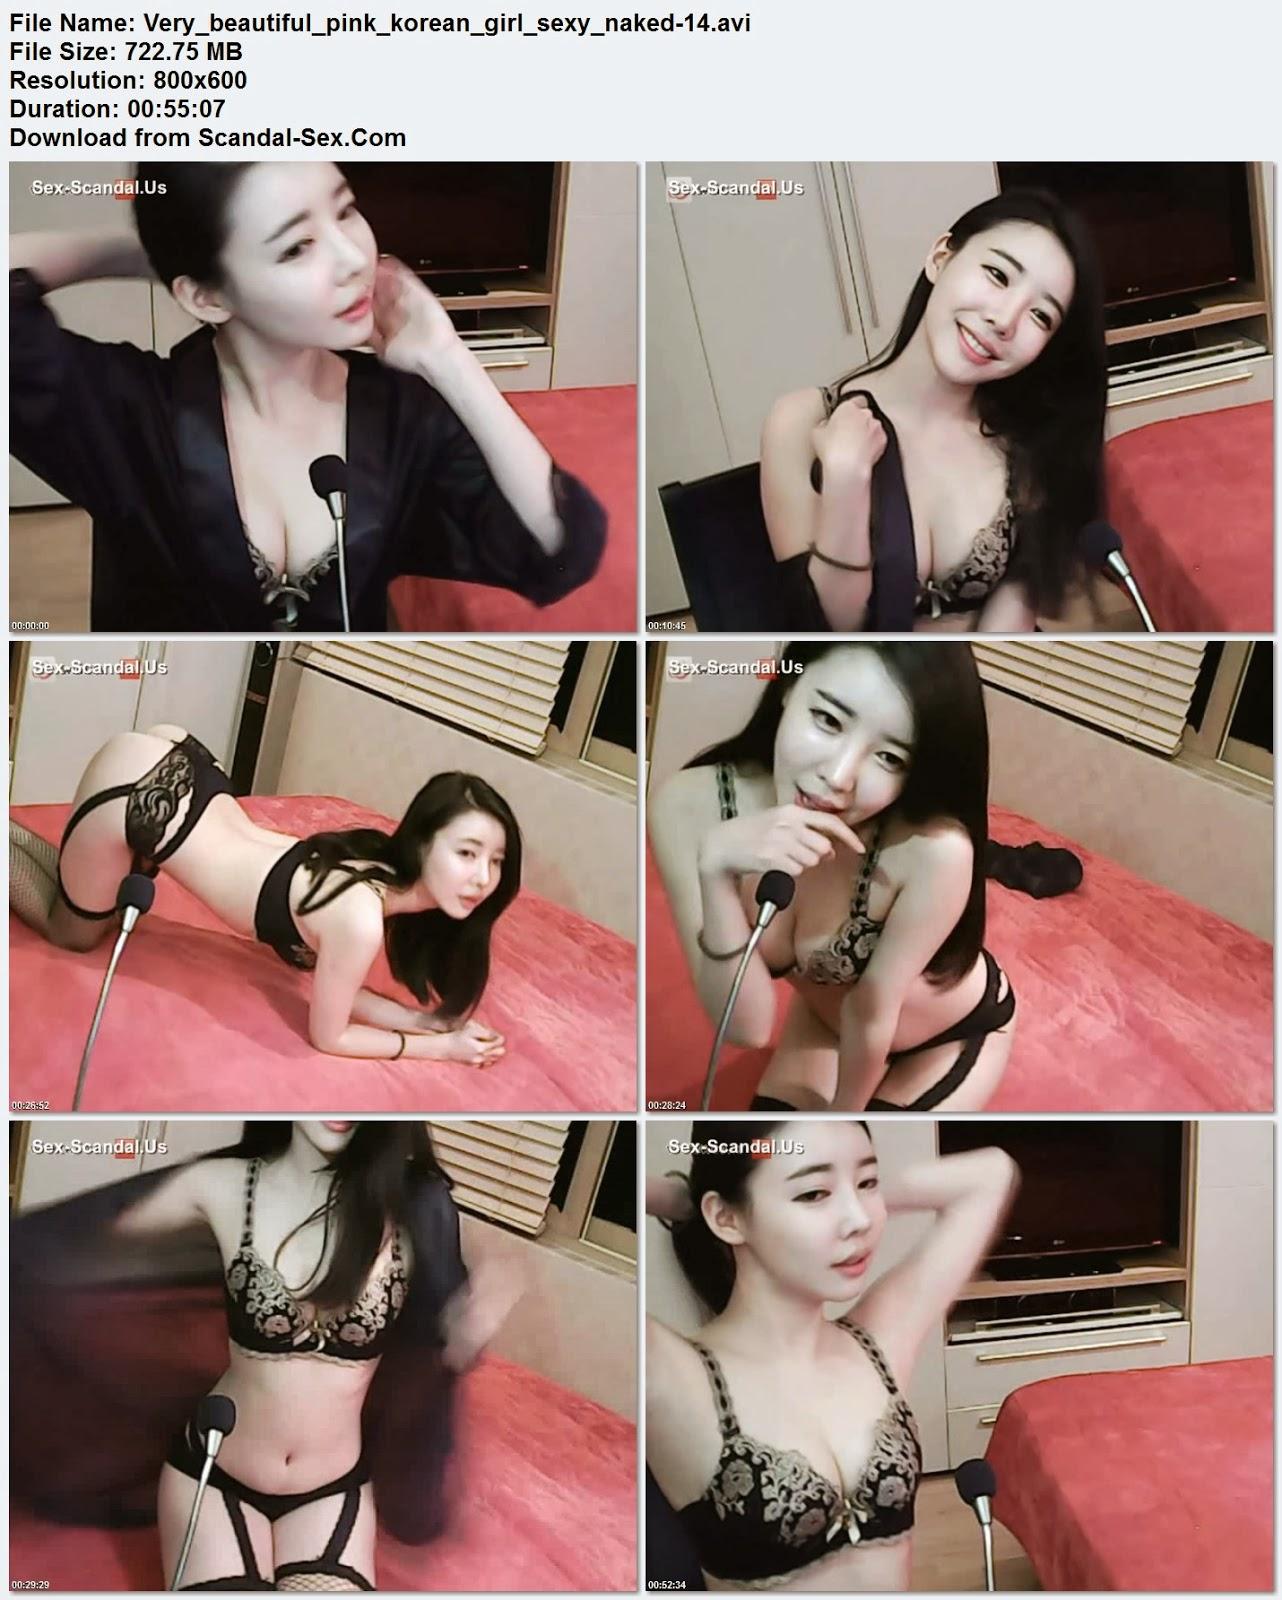 Hot beautiful nude girls sex clips in avi